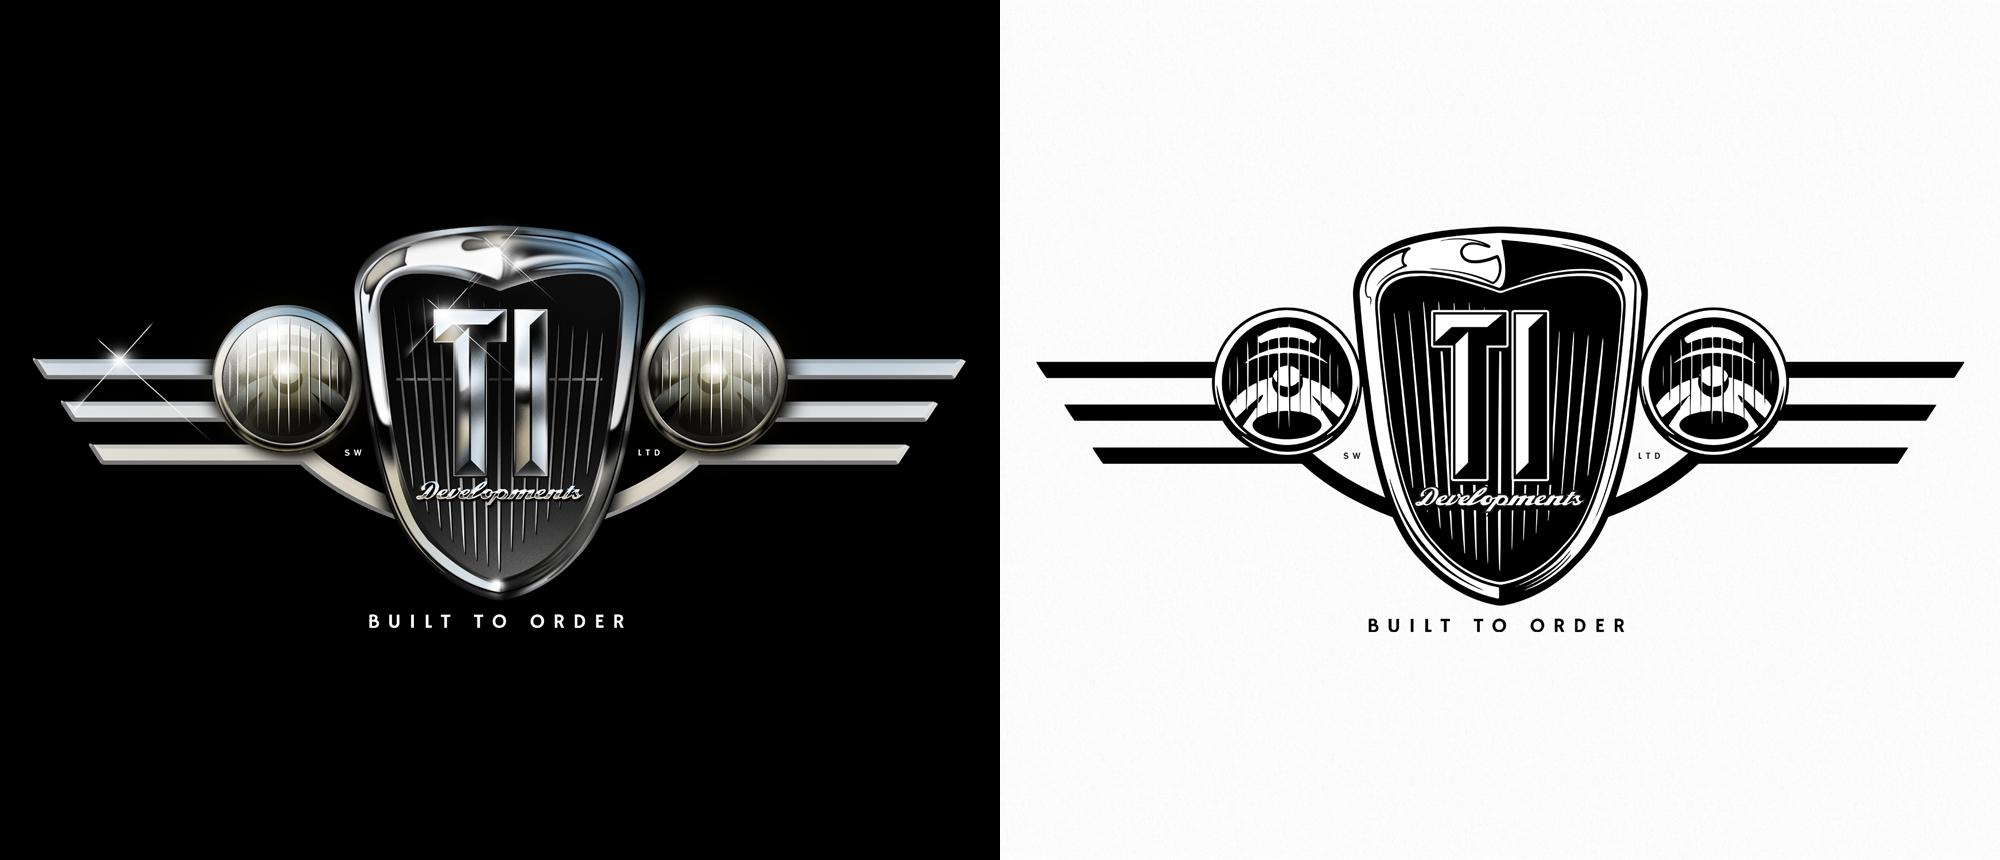 TI Side by Side Logos.jpg